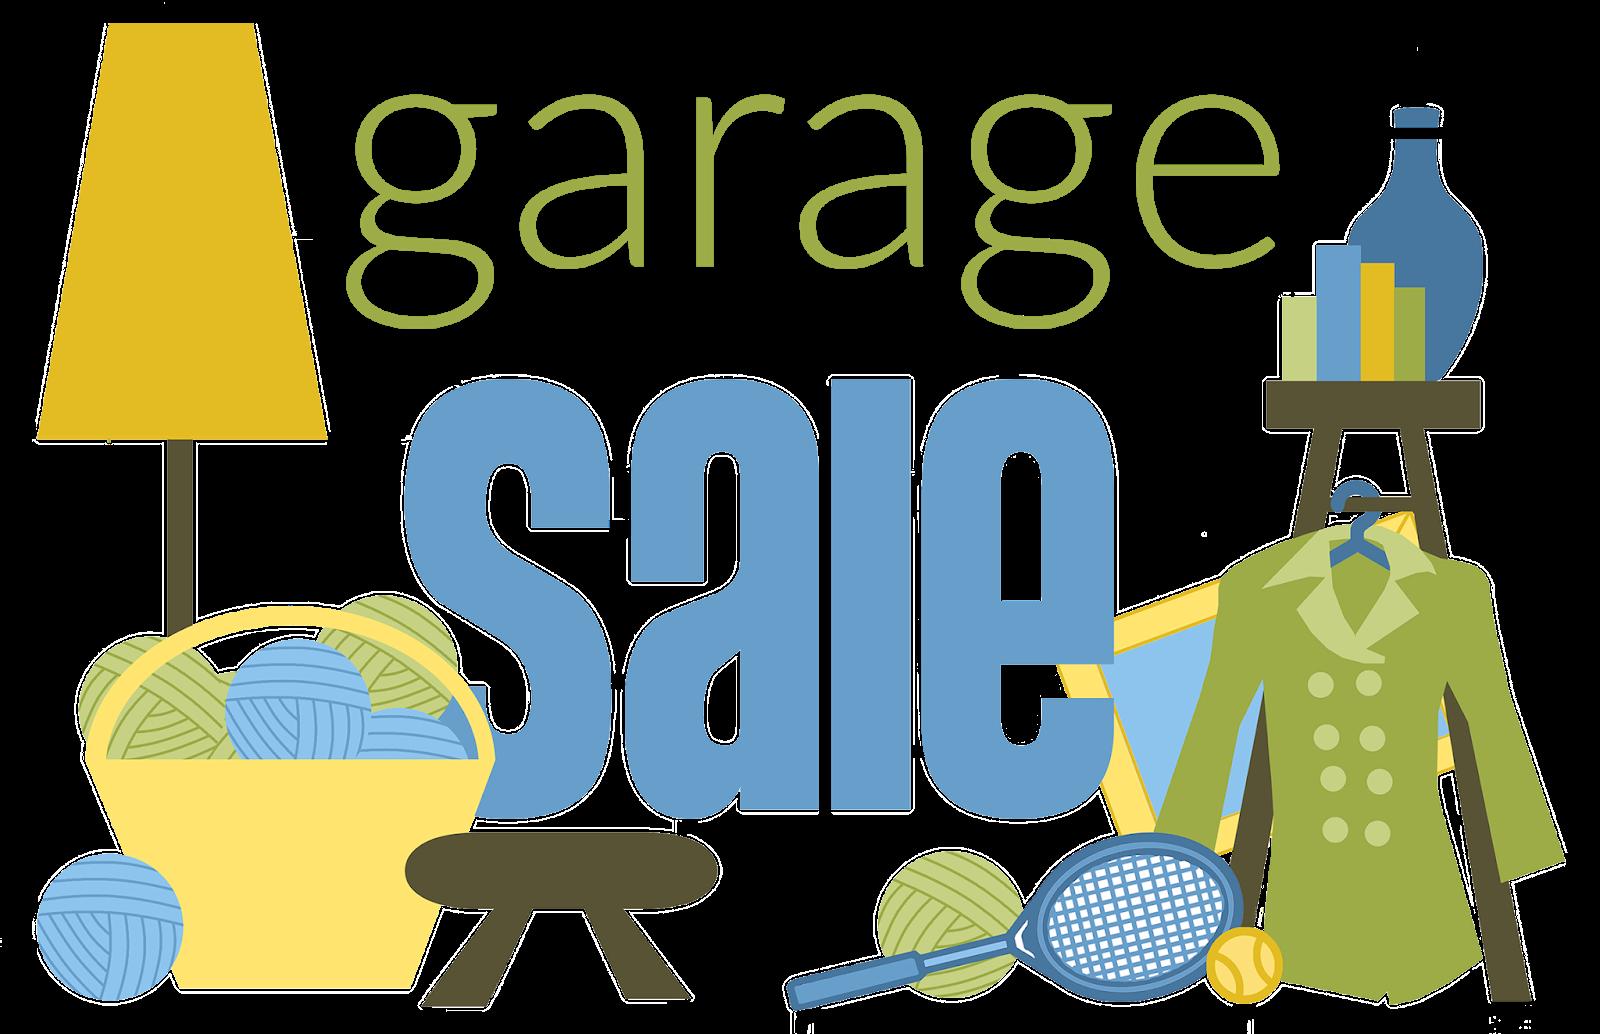 medium resolution of download large image garage sale yard sale signs clipart